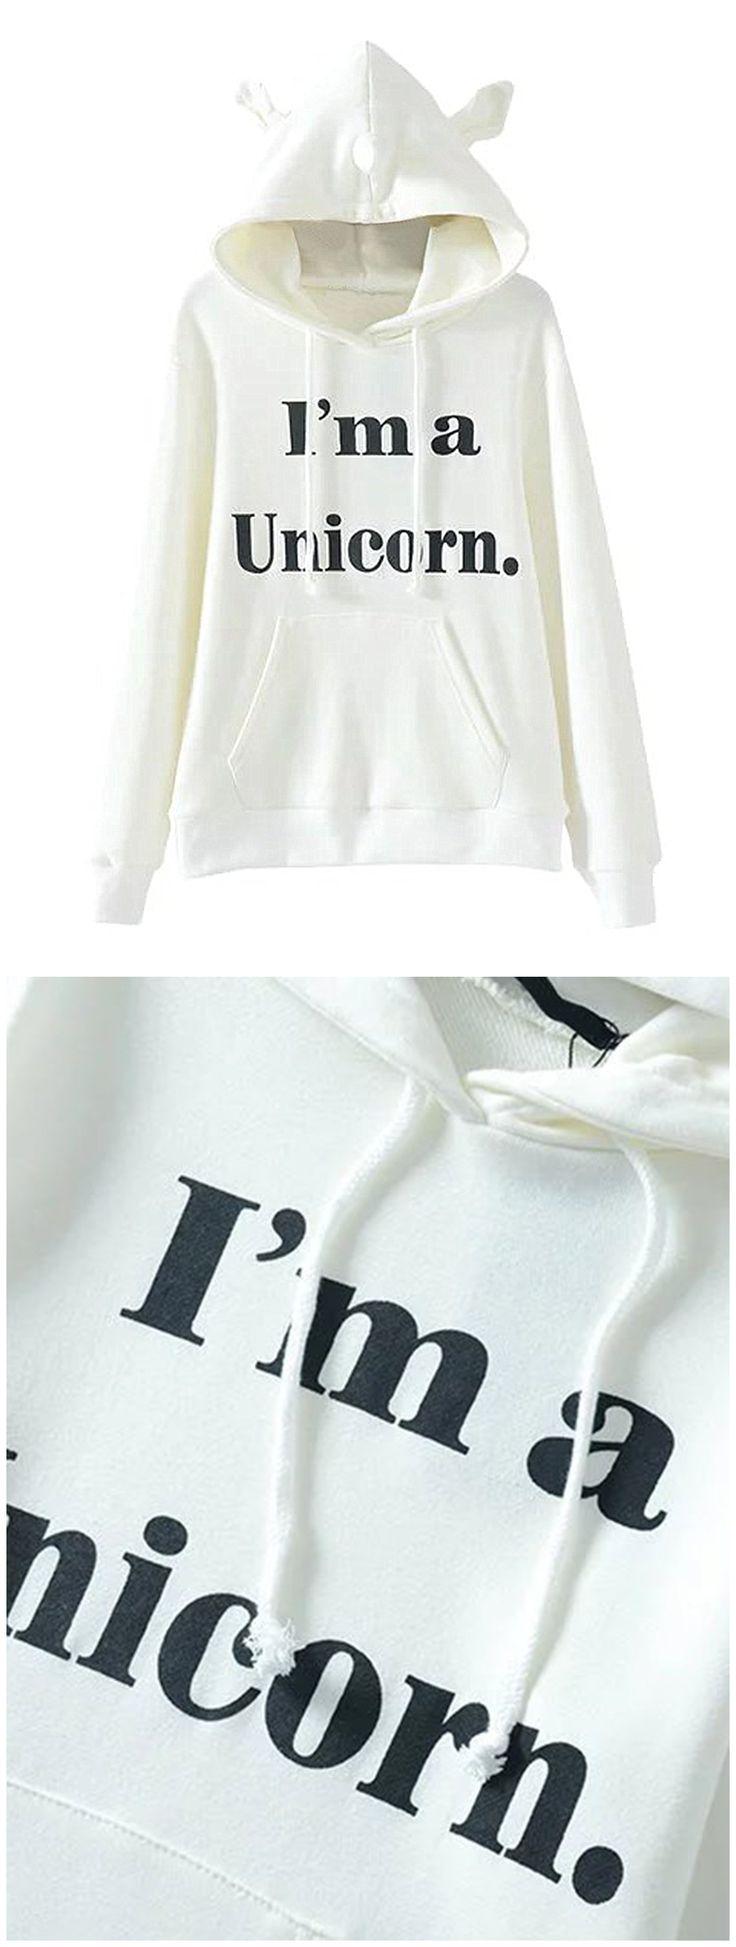 Clothink Women White Long Sleeve Letter Print Unicorn Hoodies Sweatshirt